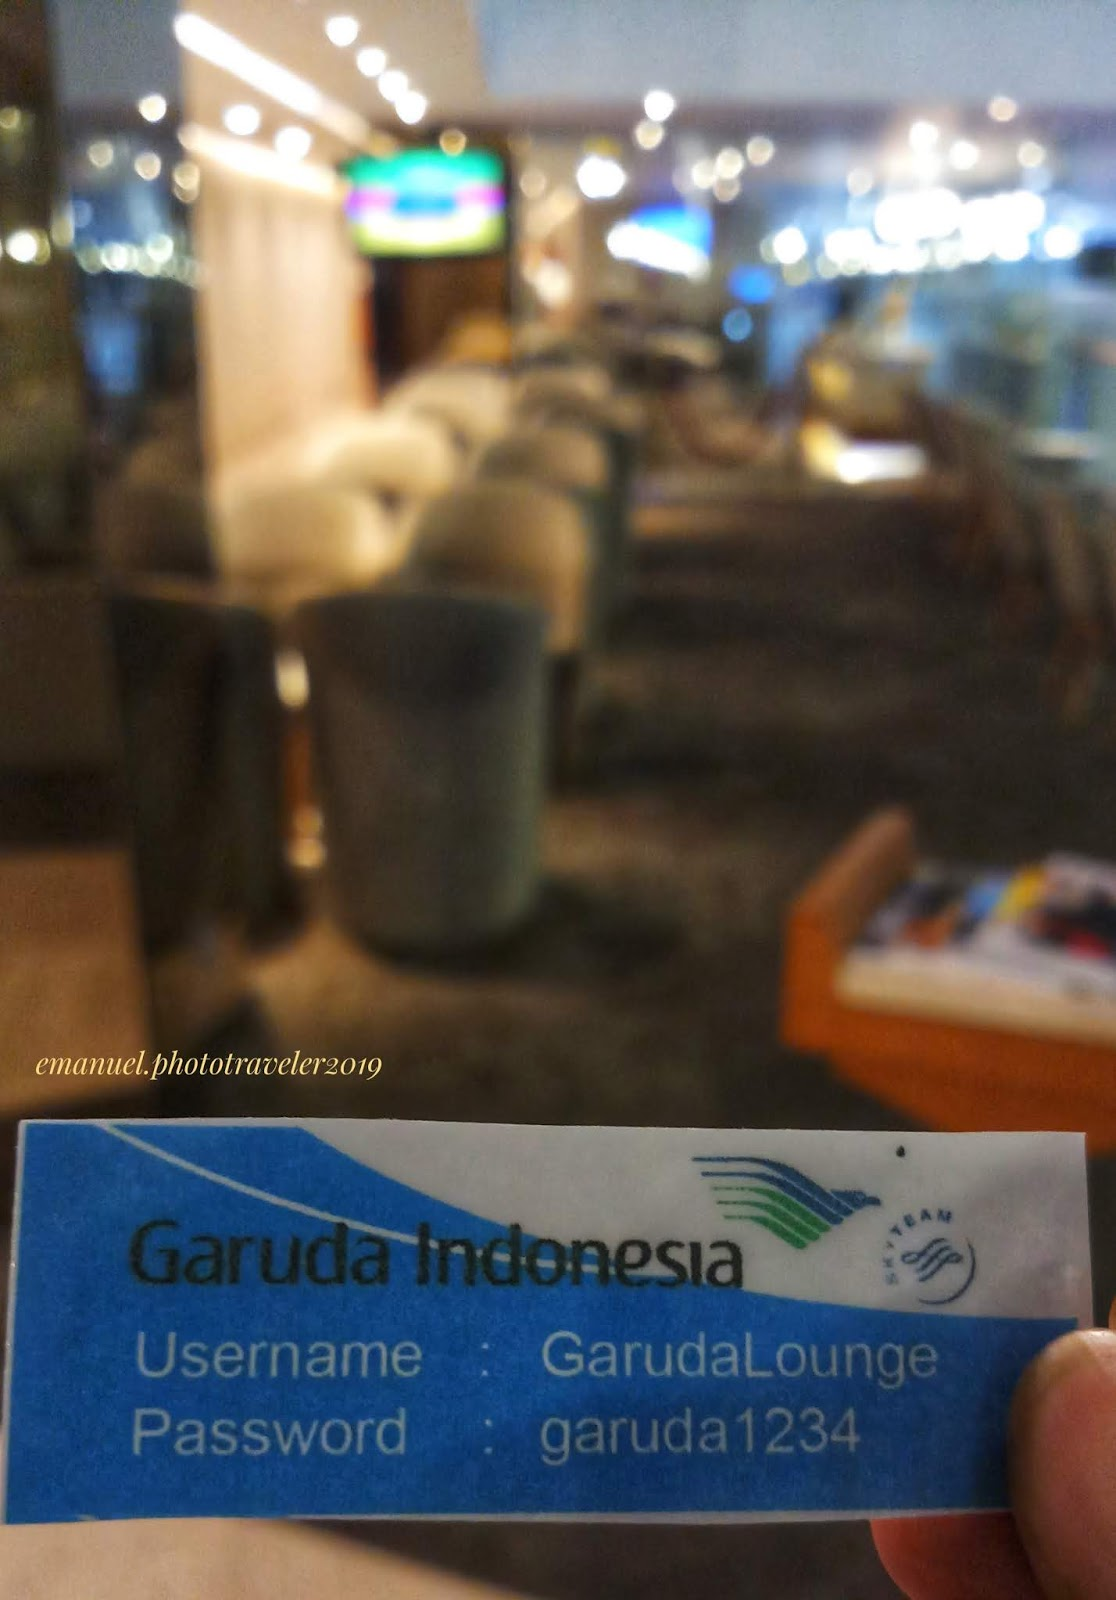 garuda indonesia executive lounge